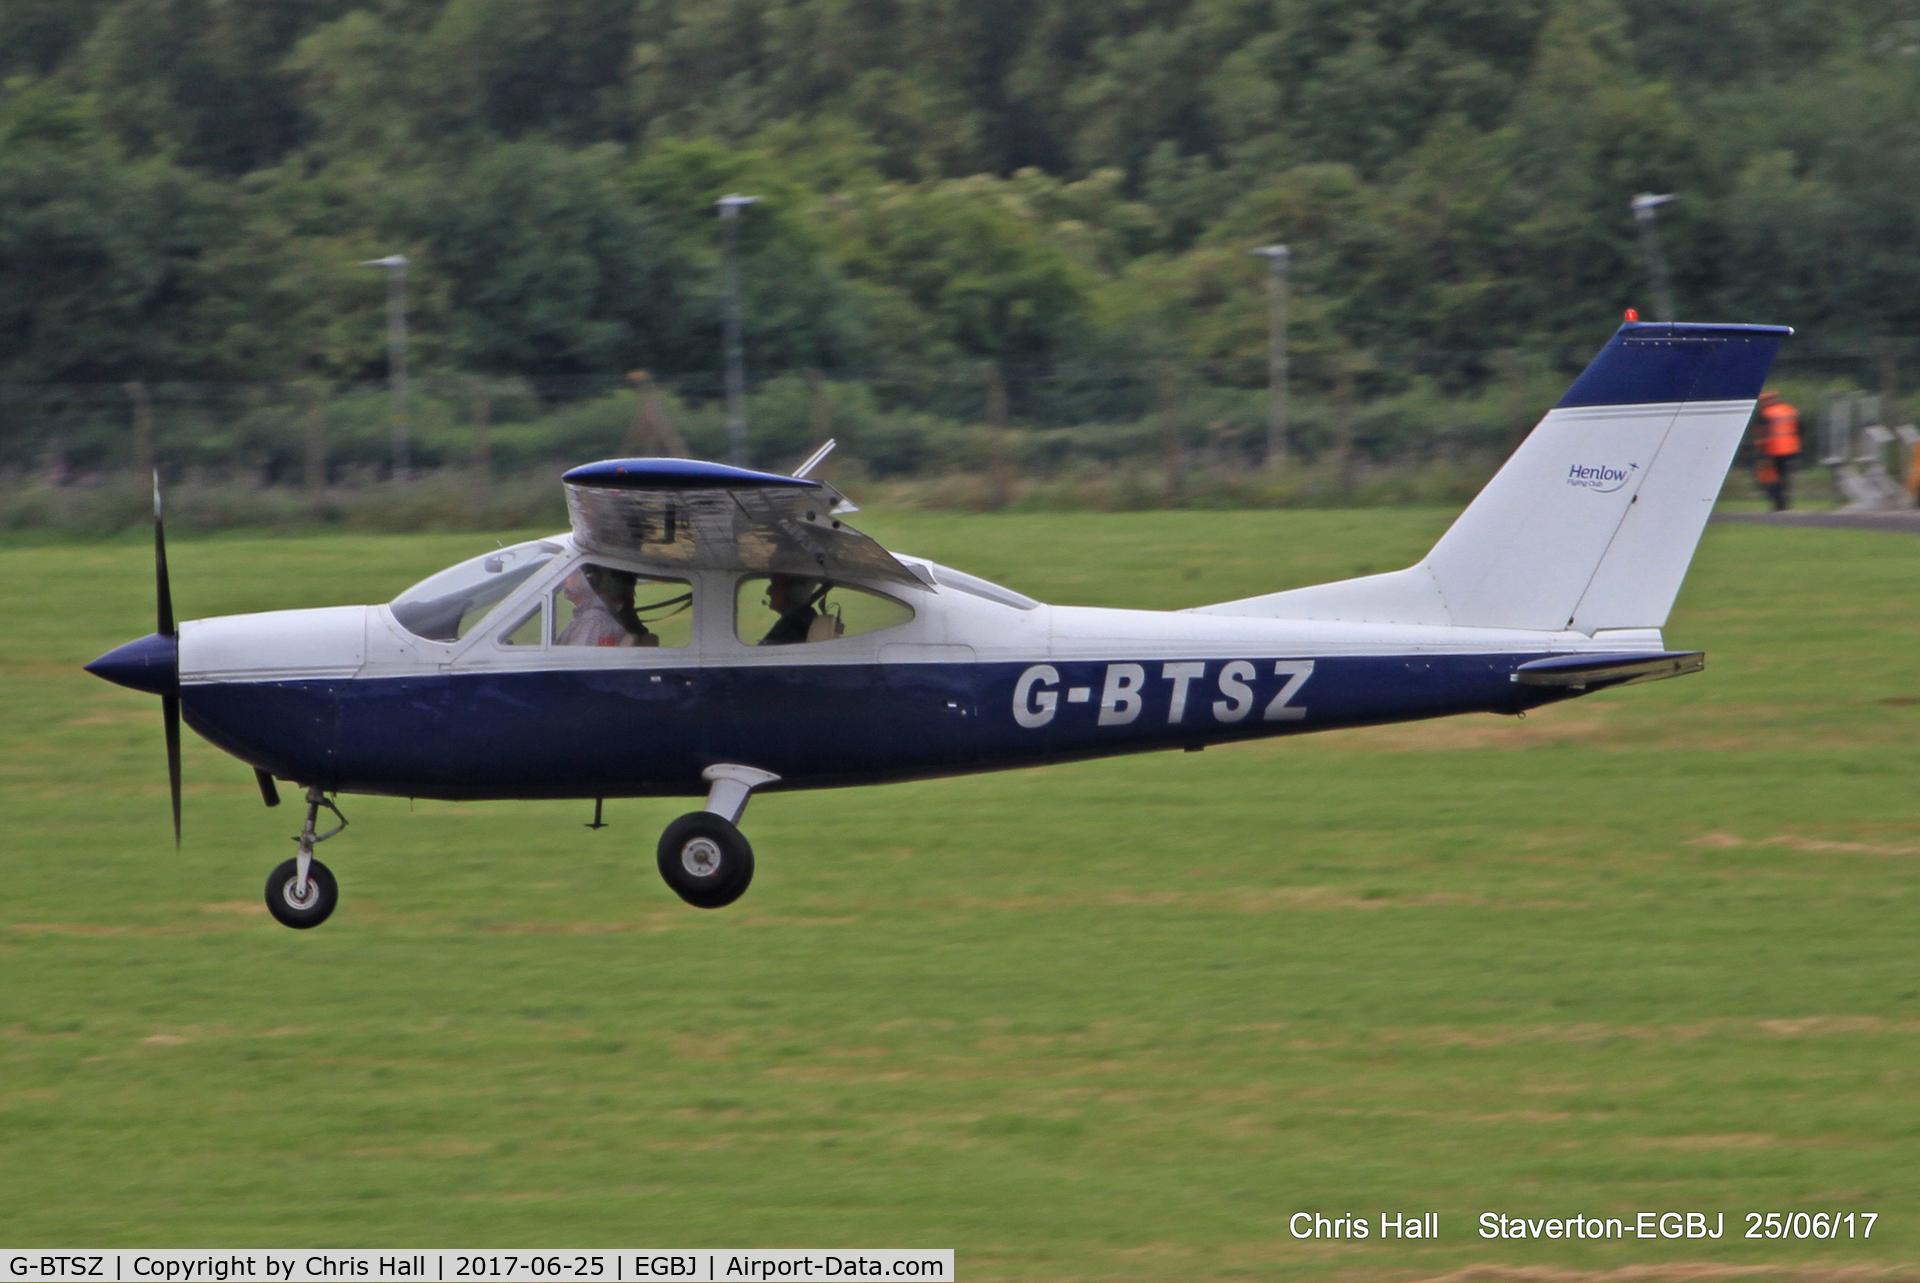 G-BTSZ, 1969 Cessna 177A Cardinal C/N 177-01198, Project Propeller at Staverton